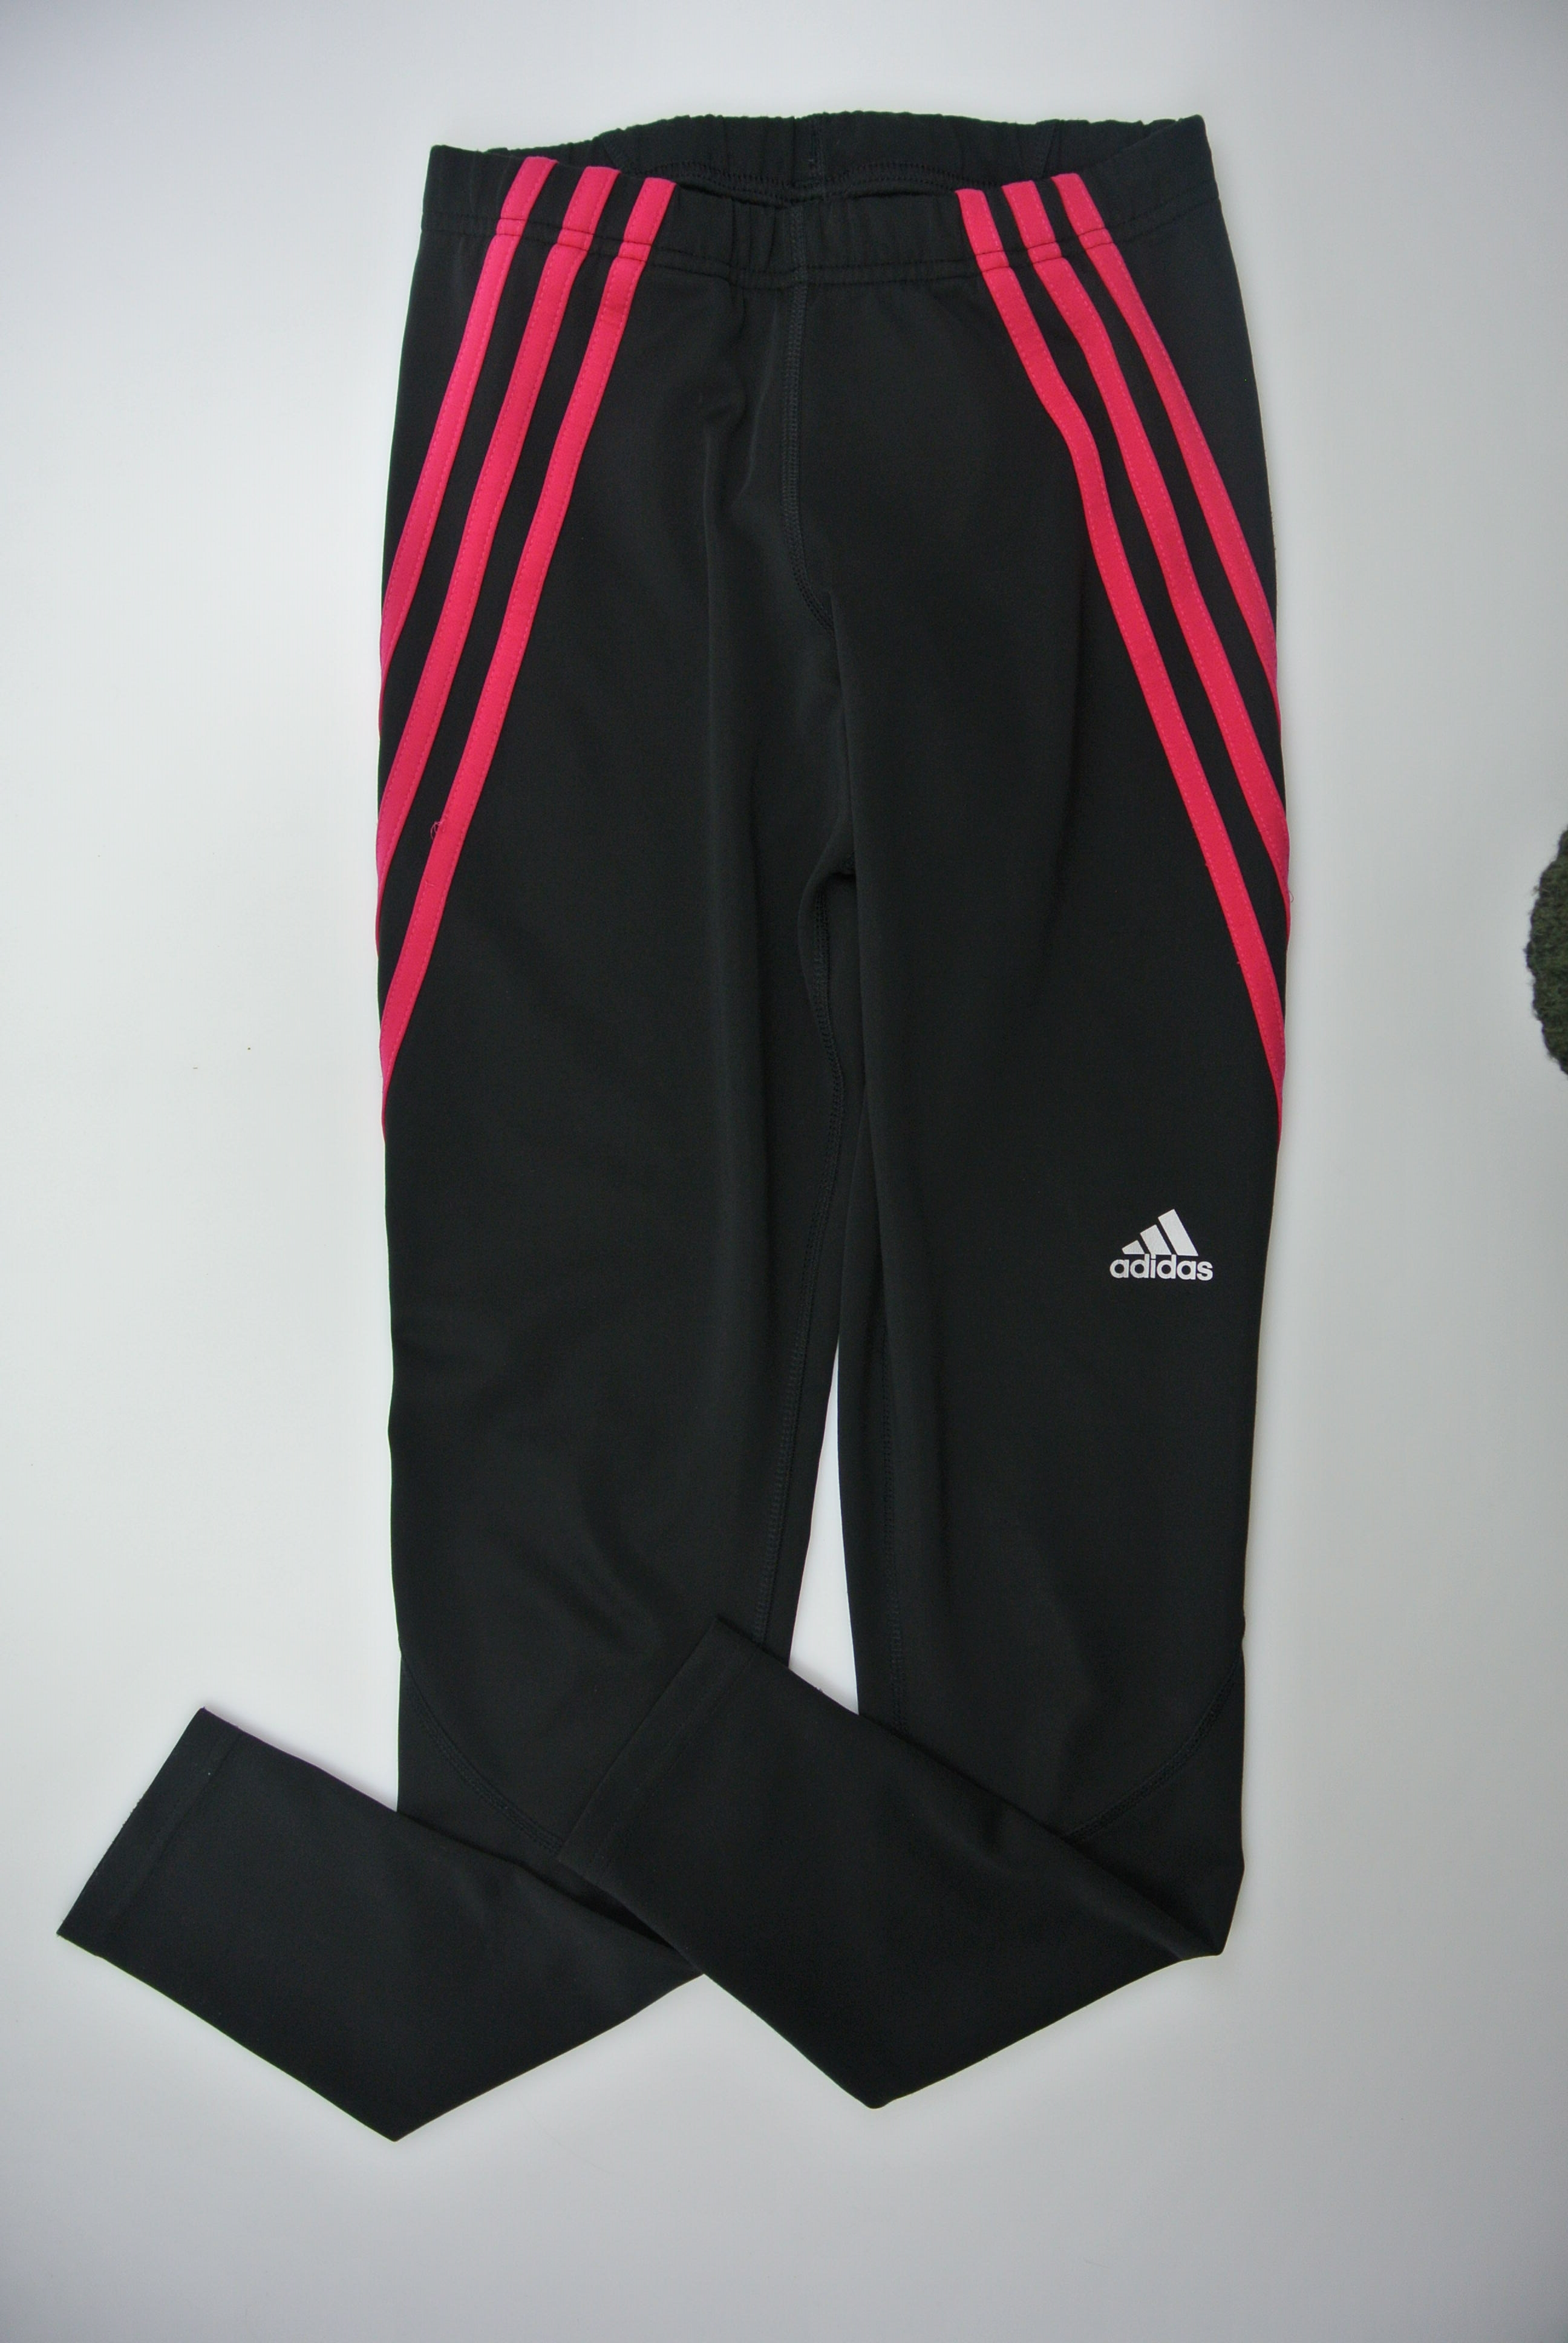 Adidas bukser str 152 pige